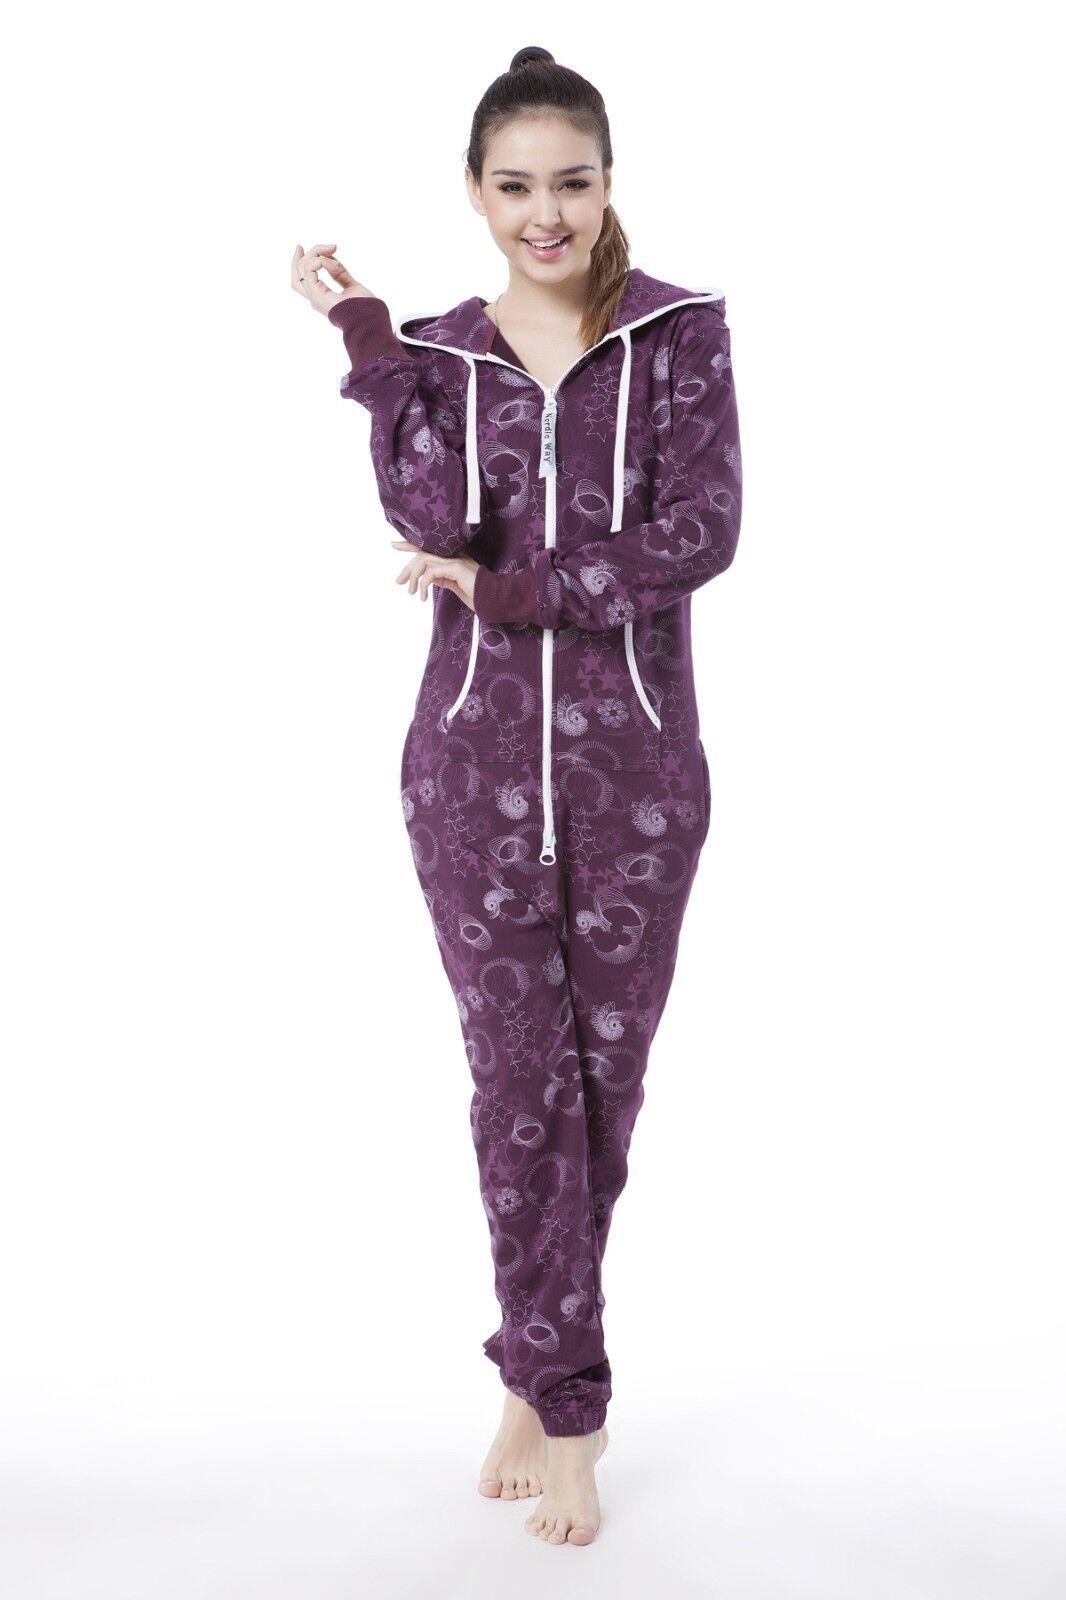 Nordic Way Fashion One Piece Jumpsuit Print Adult Women Romper Hoodie Fleece